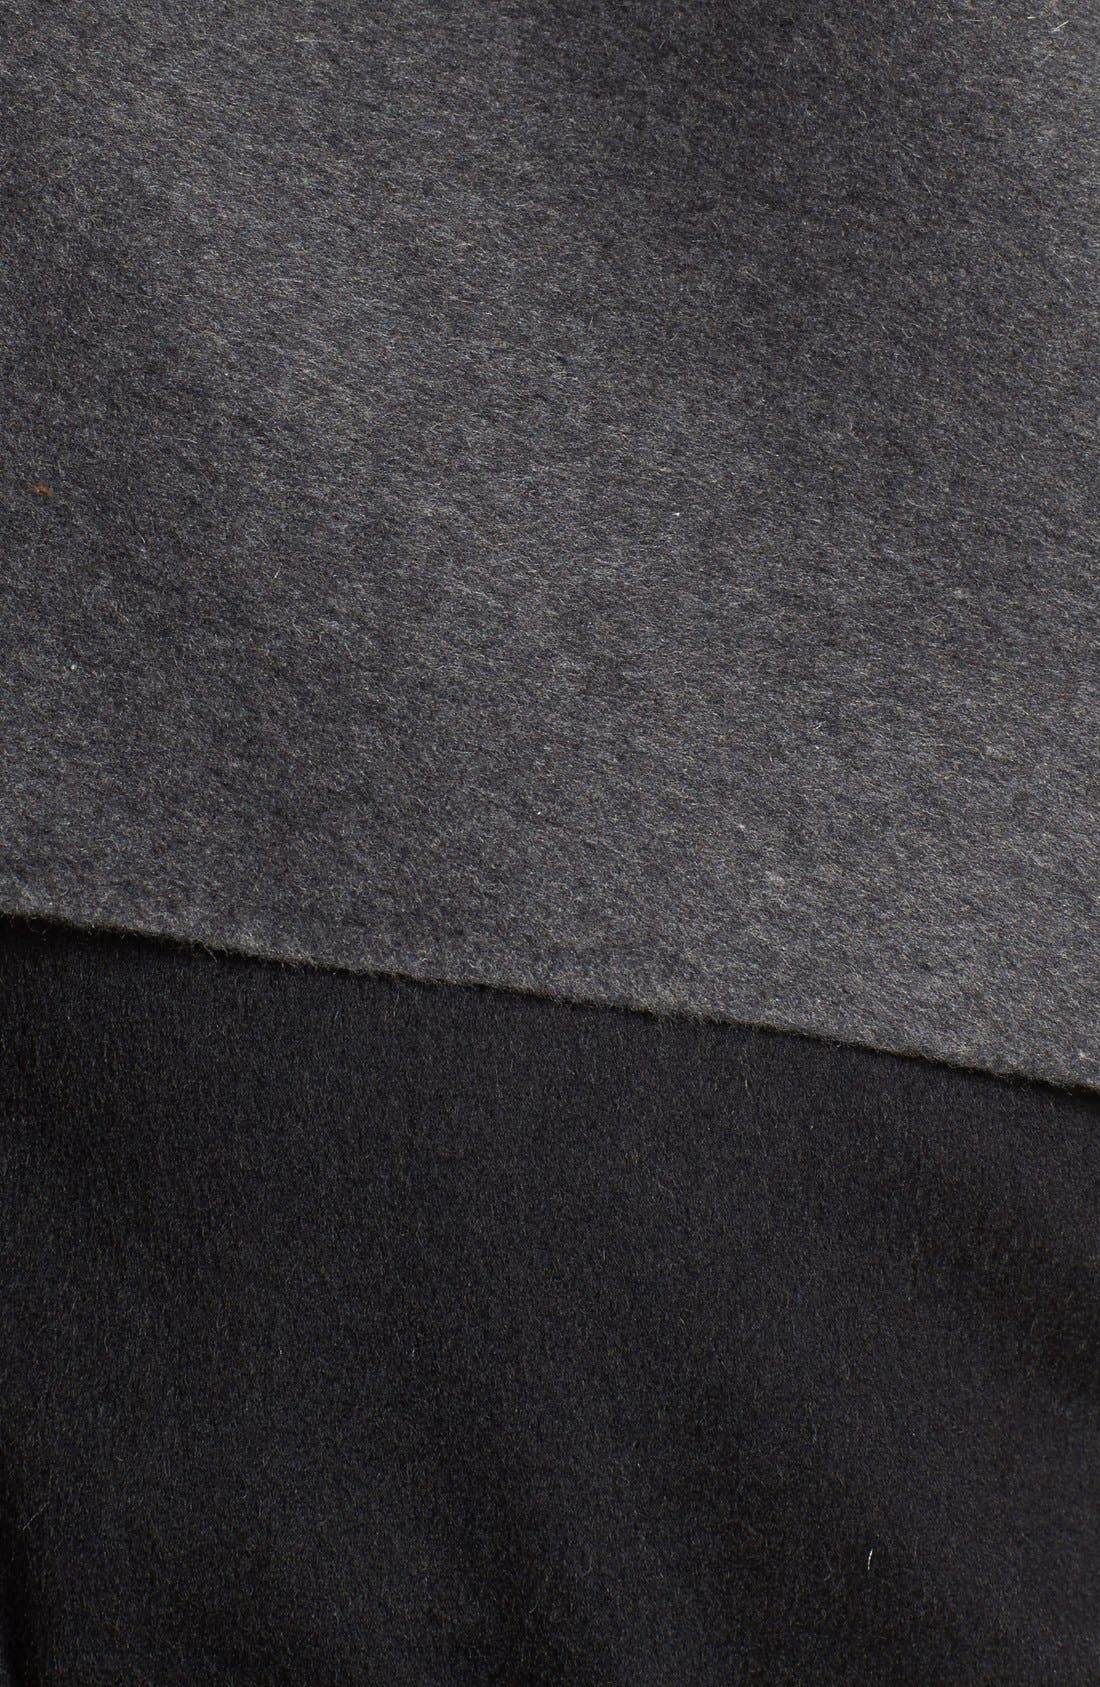 Leather Sleeve Wool Blend Wrap Coat,                             Alternate thumbnail 5, color,                             001